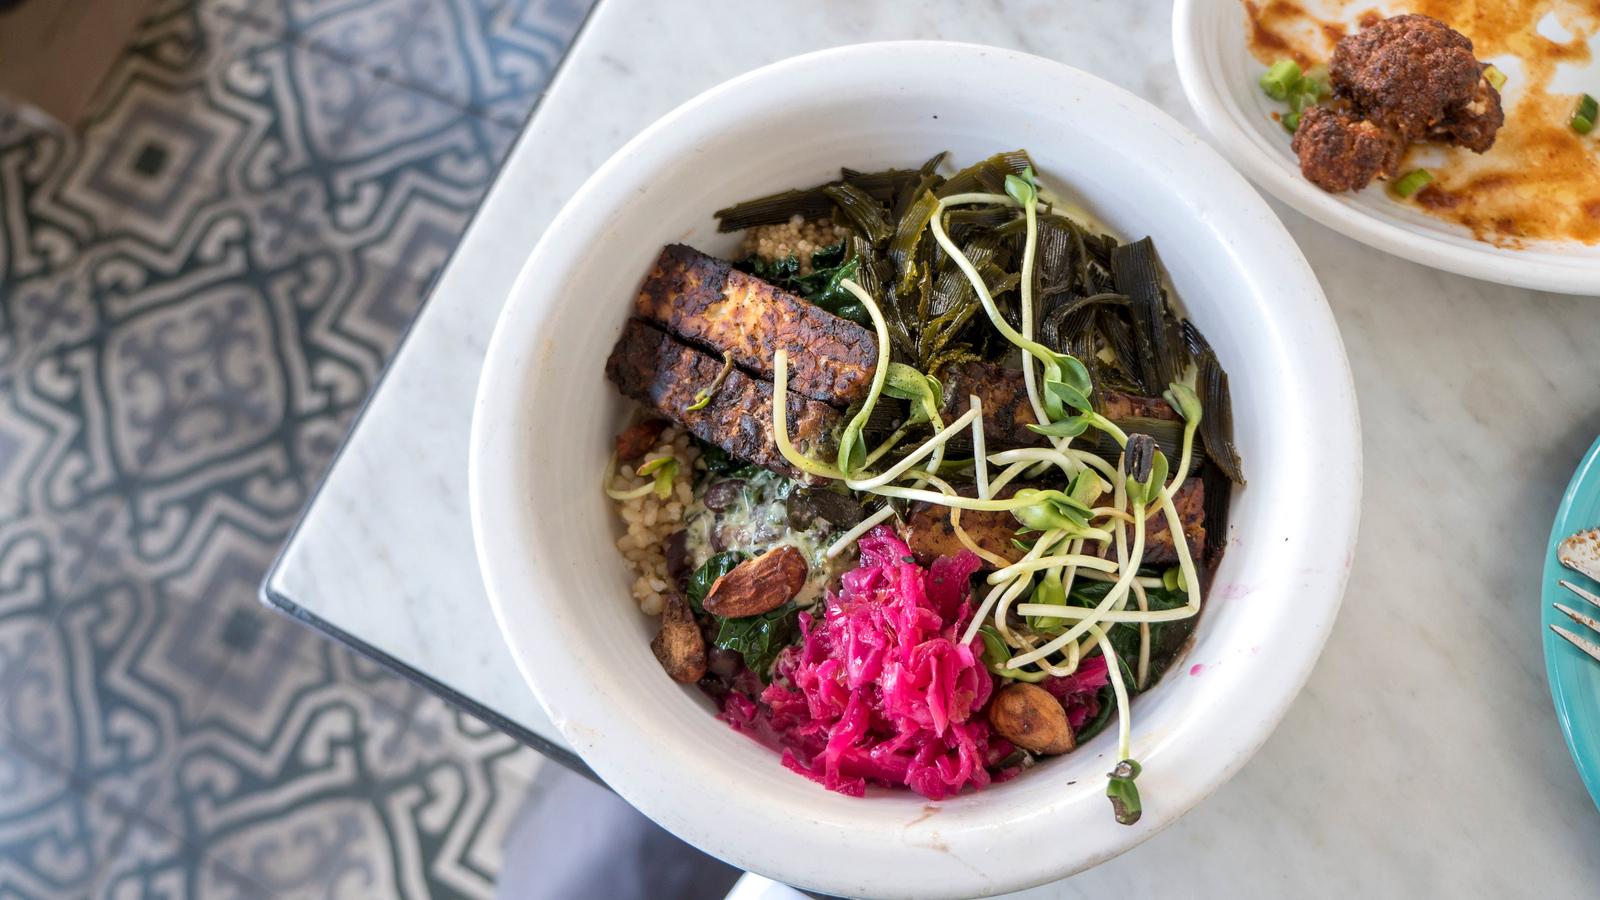 Cafe Gratitude -Vegan restaurant in Los Angeles